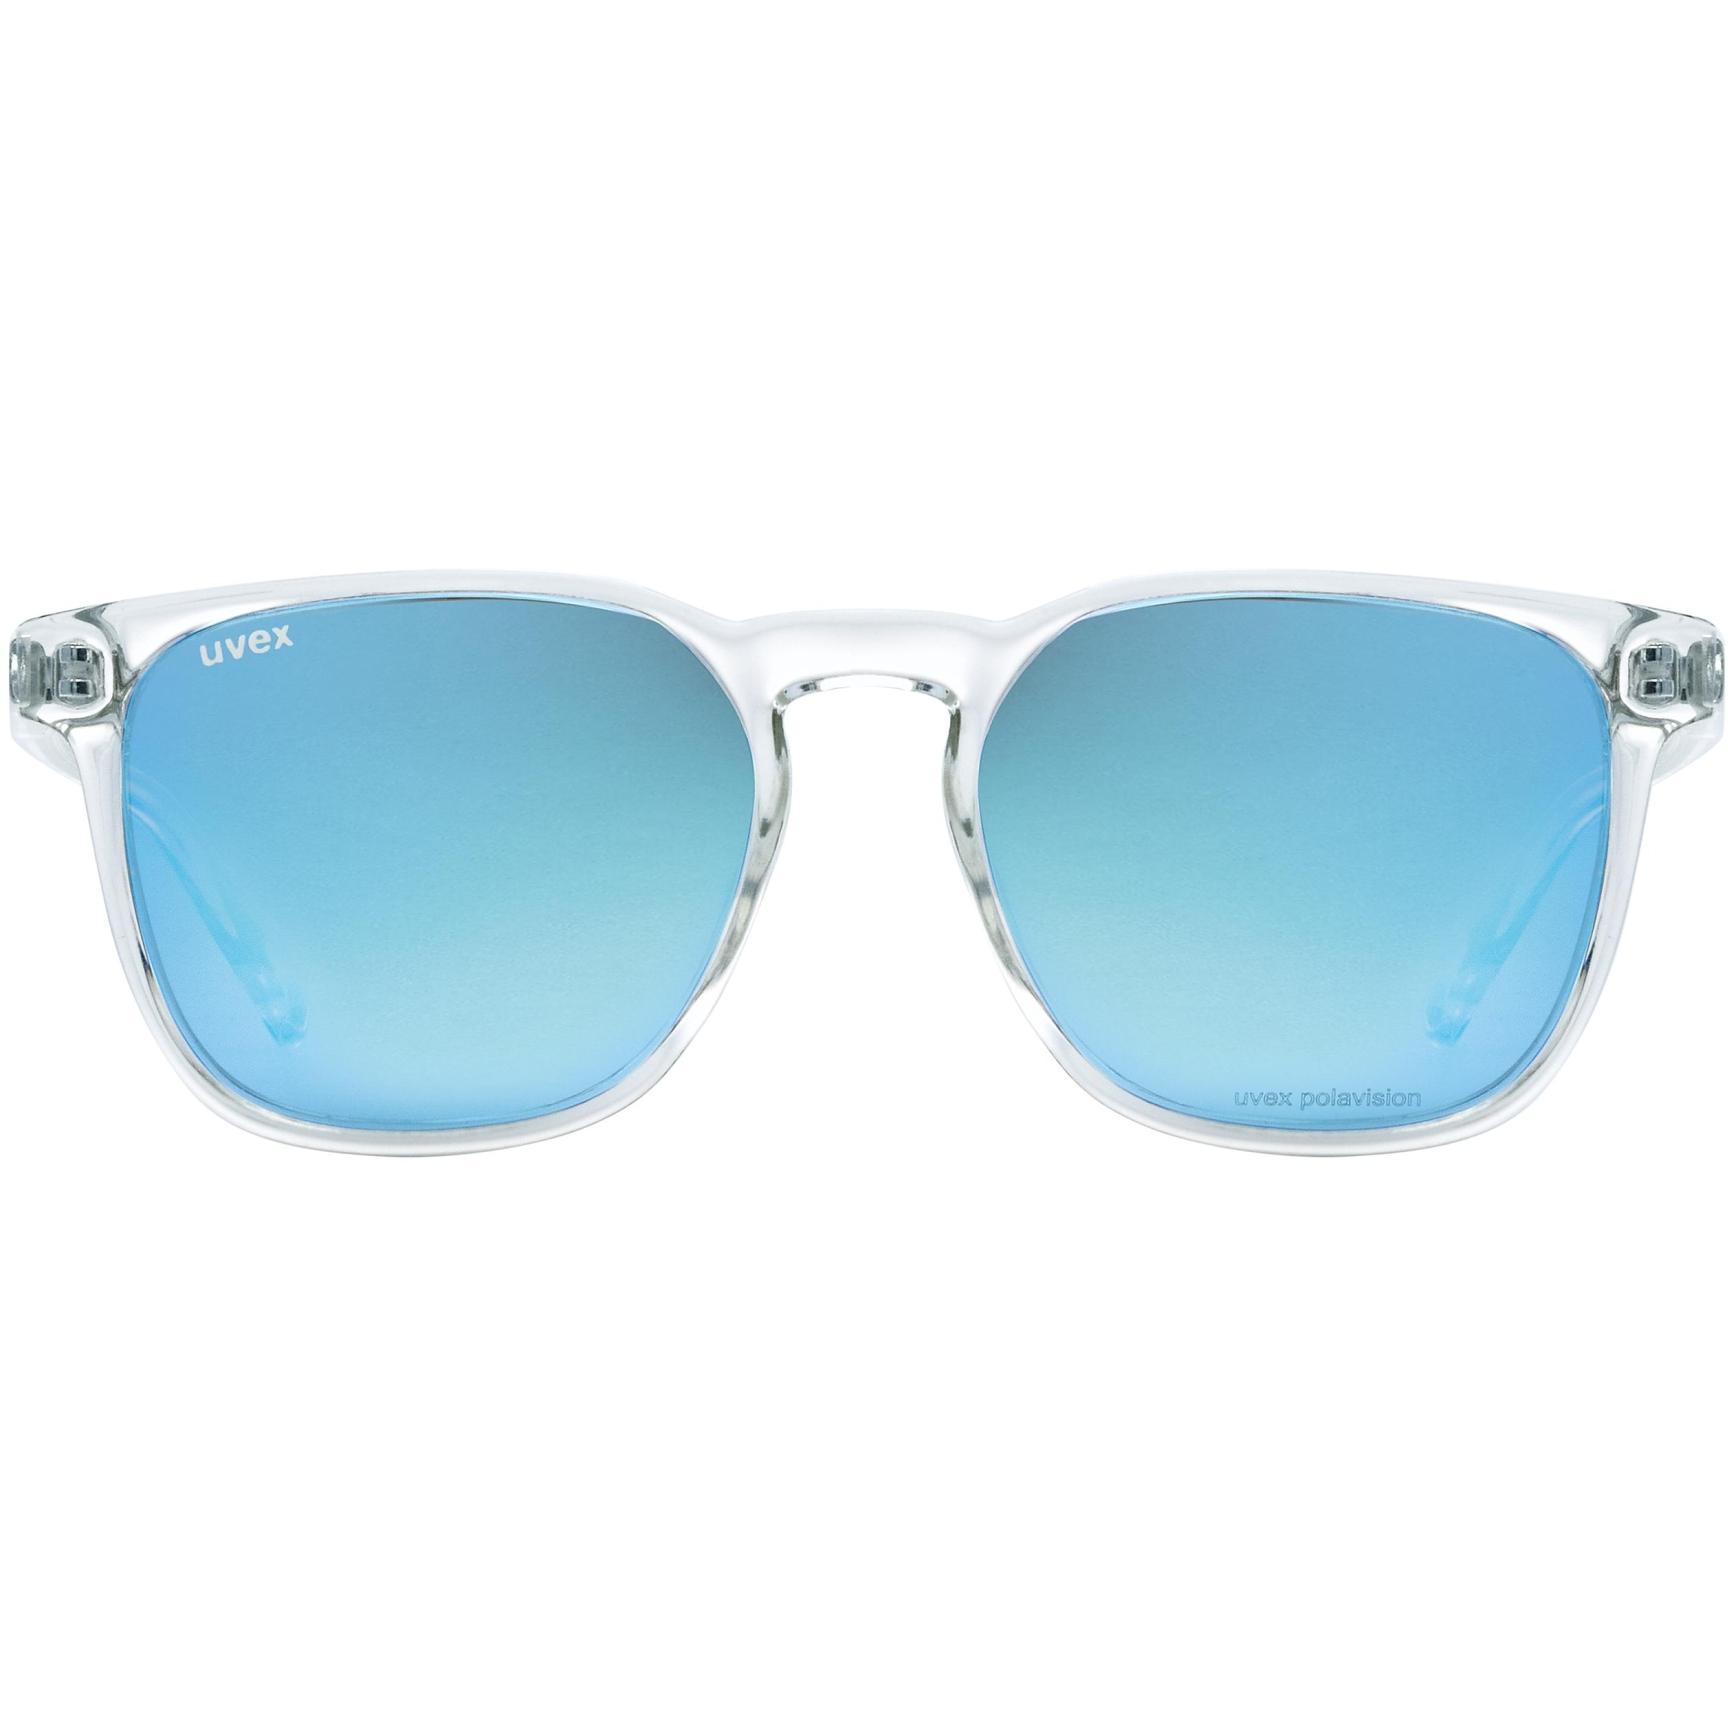 Image of Uvex lgl 49 P Glasses - clear/polavision mirror blue